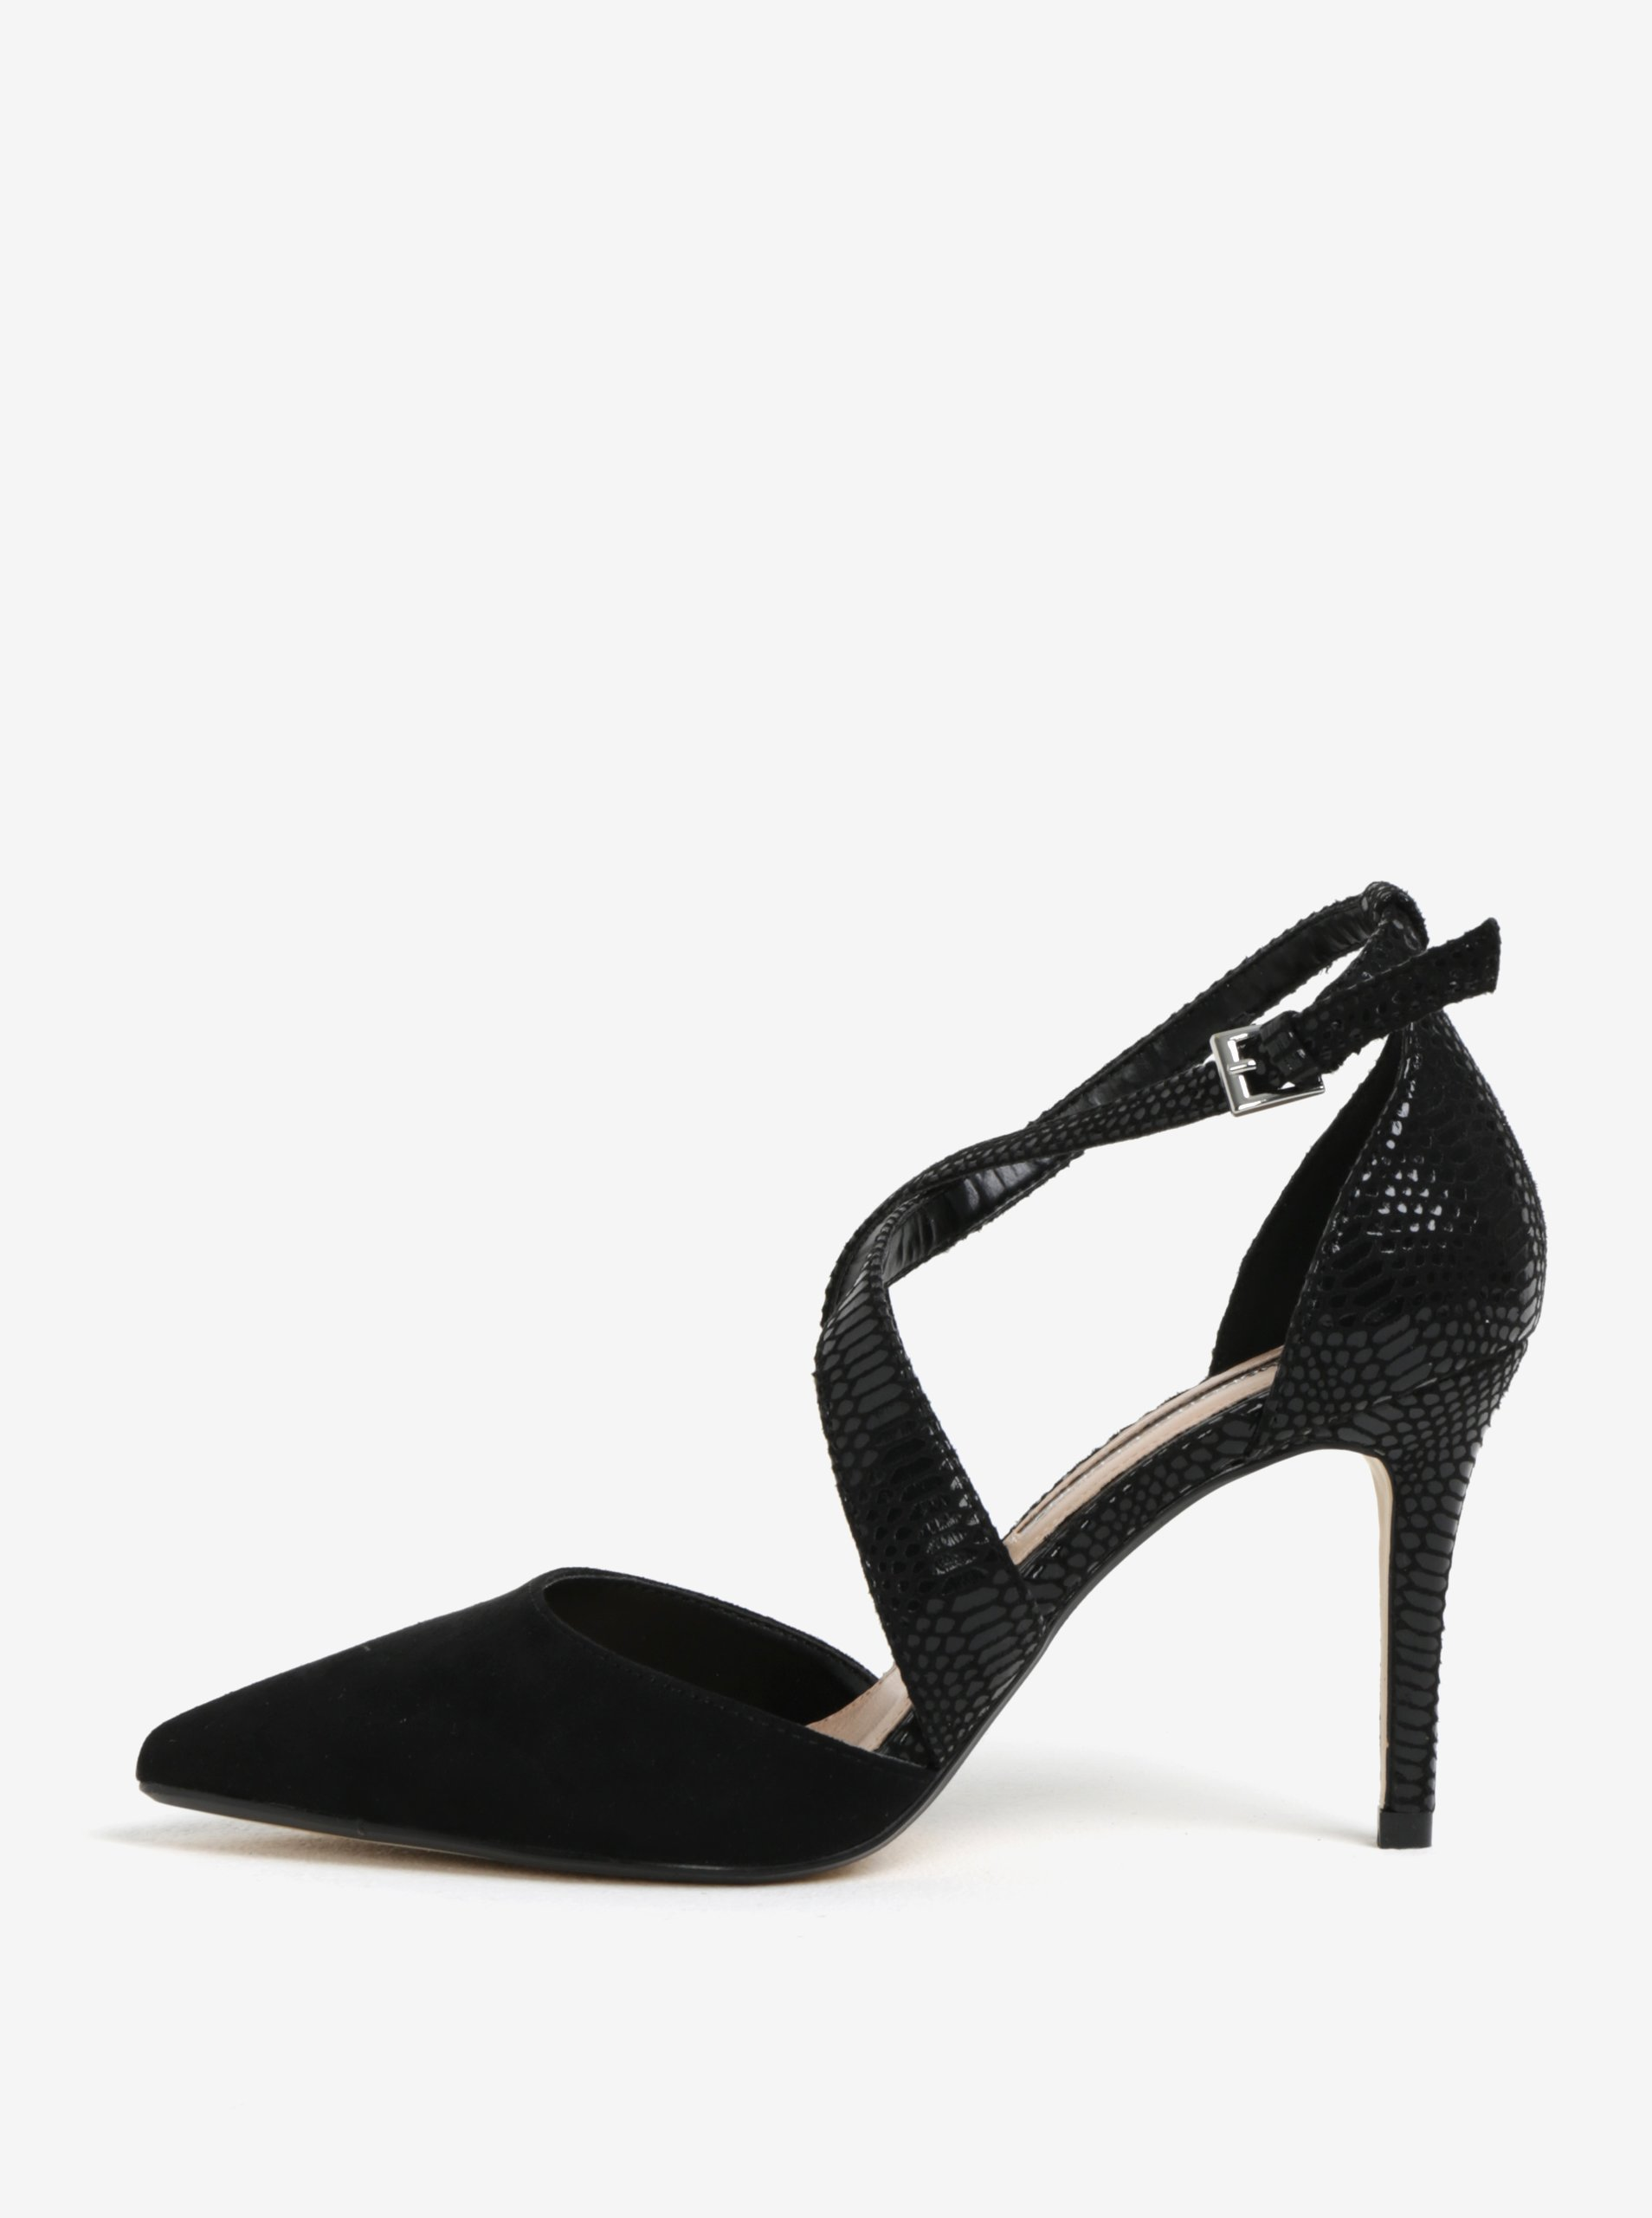 c5751ee258ce0 Čierne sandálky s hadím vzorom Dorothy Perkins | Moda.sk